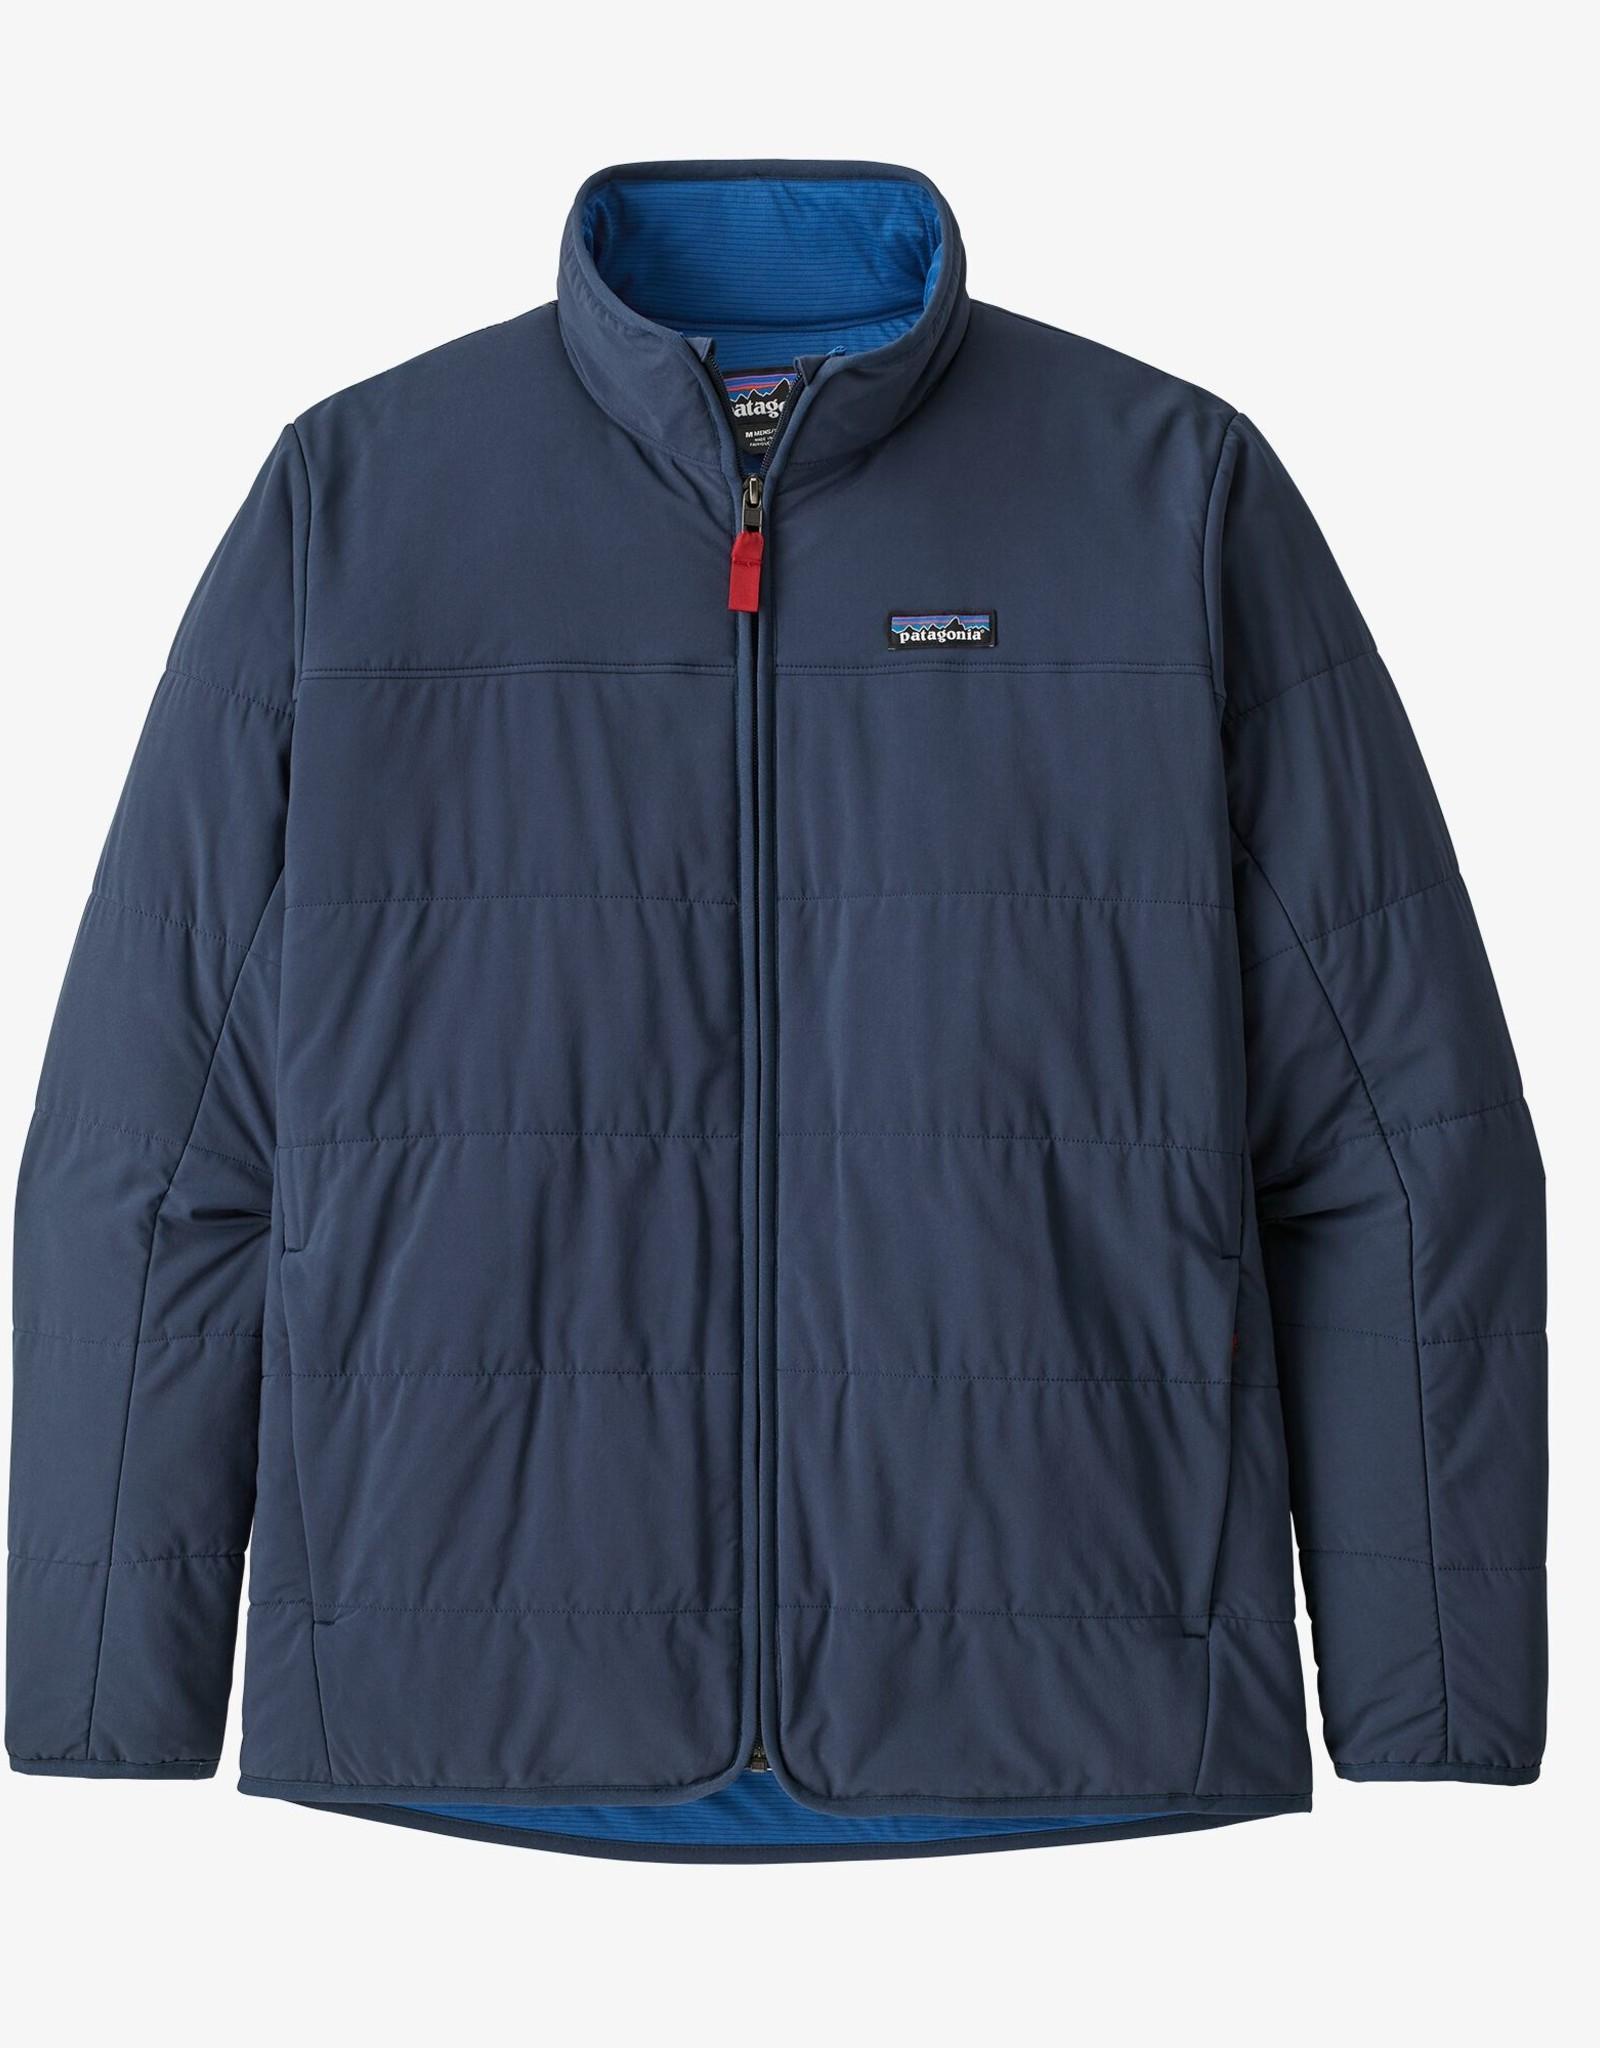 Patagonia Patagonia Pack In Jacket Men's